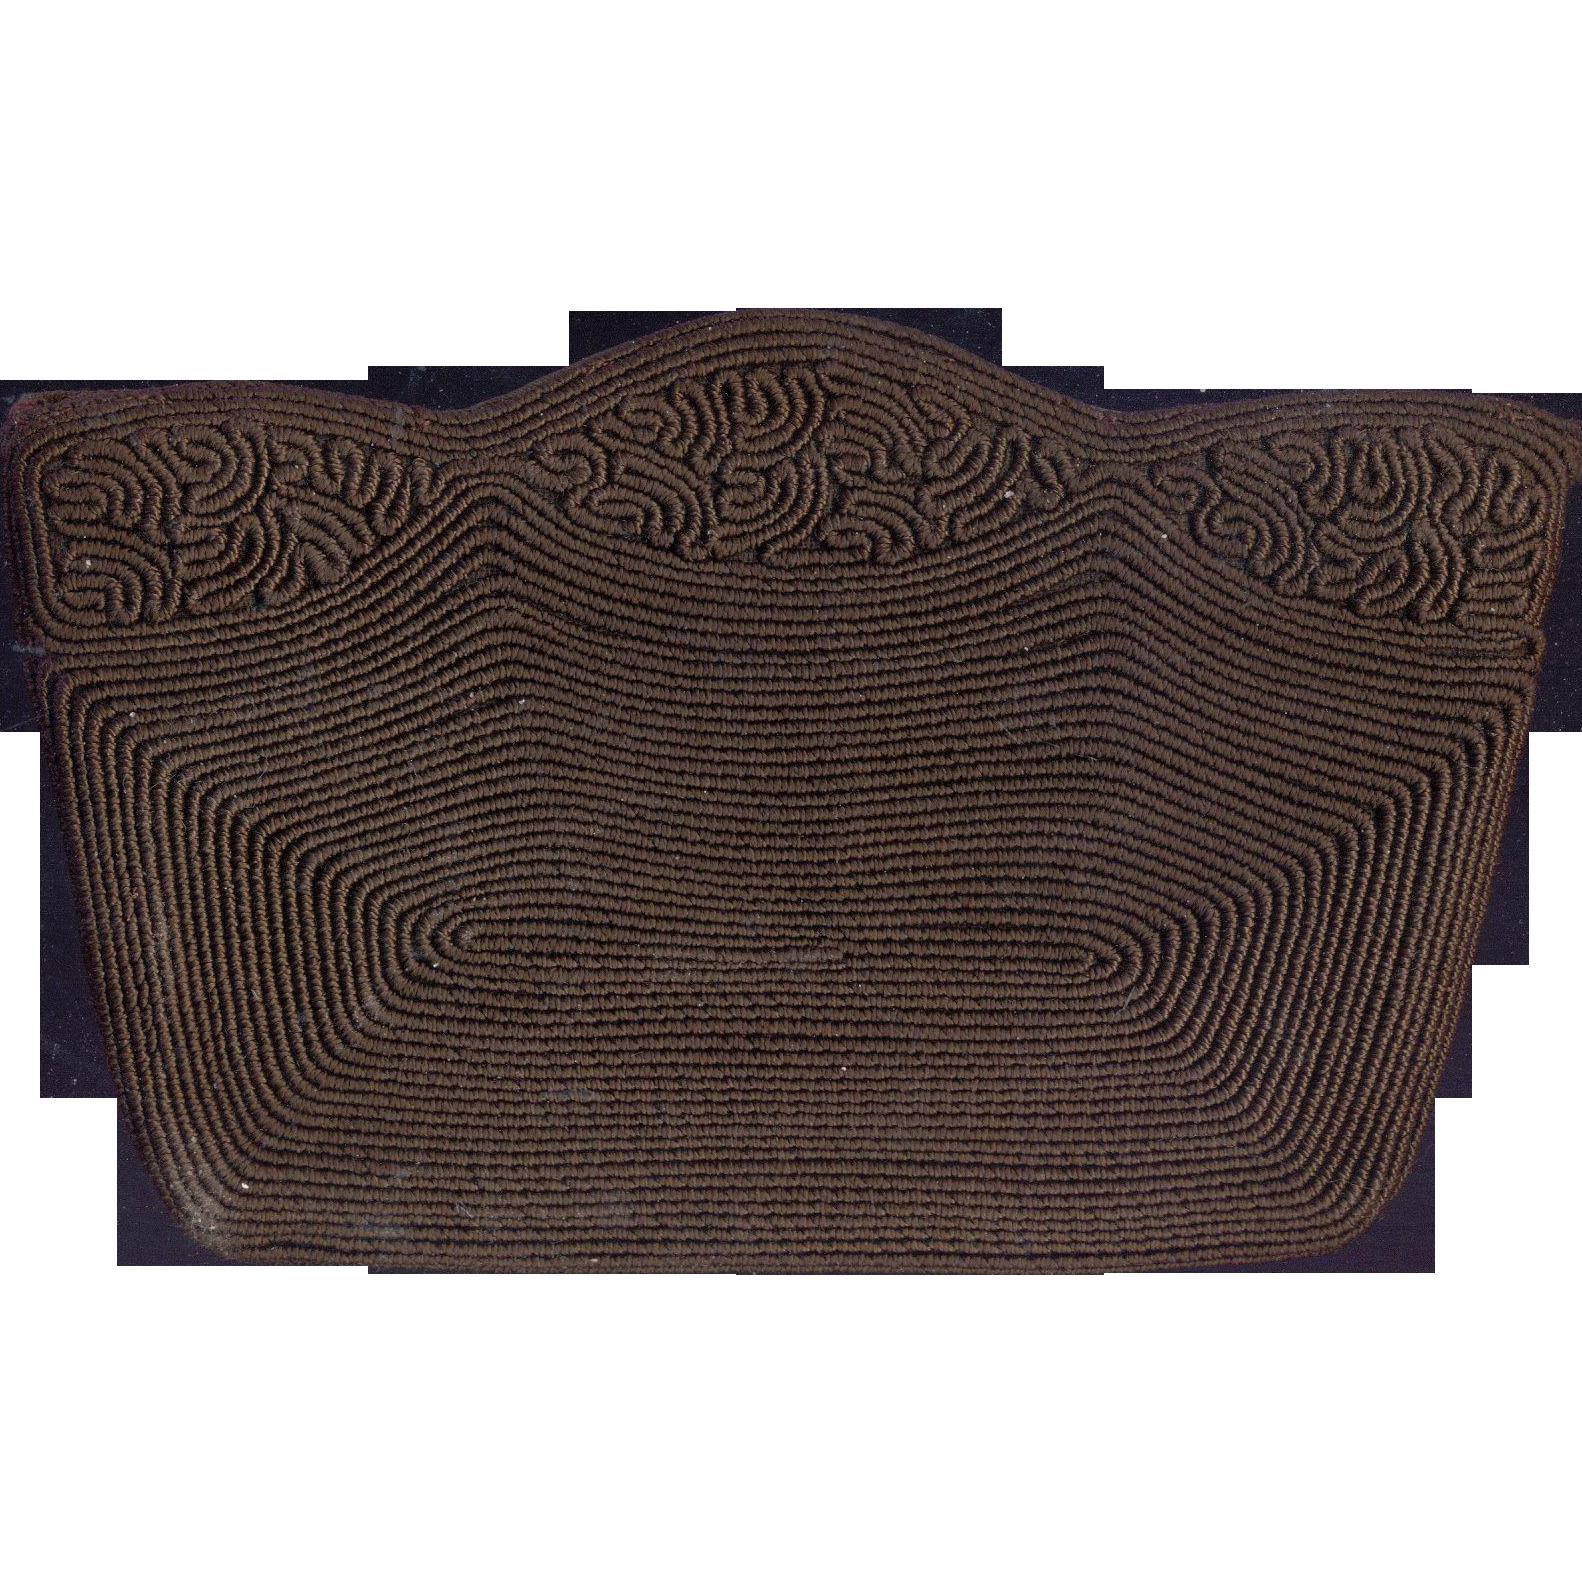 Brown Vintage Corde' Clutch Purse